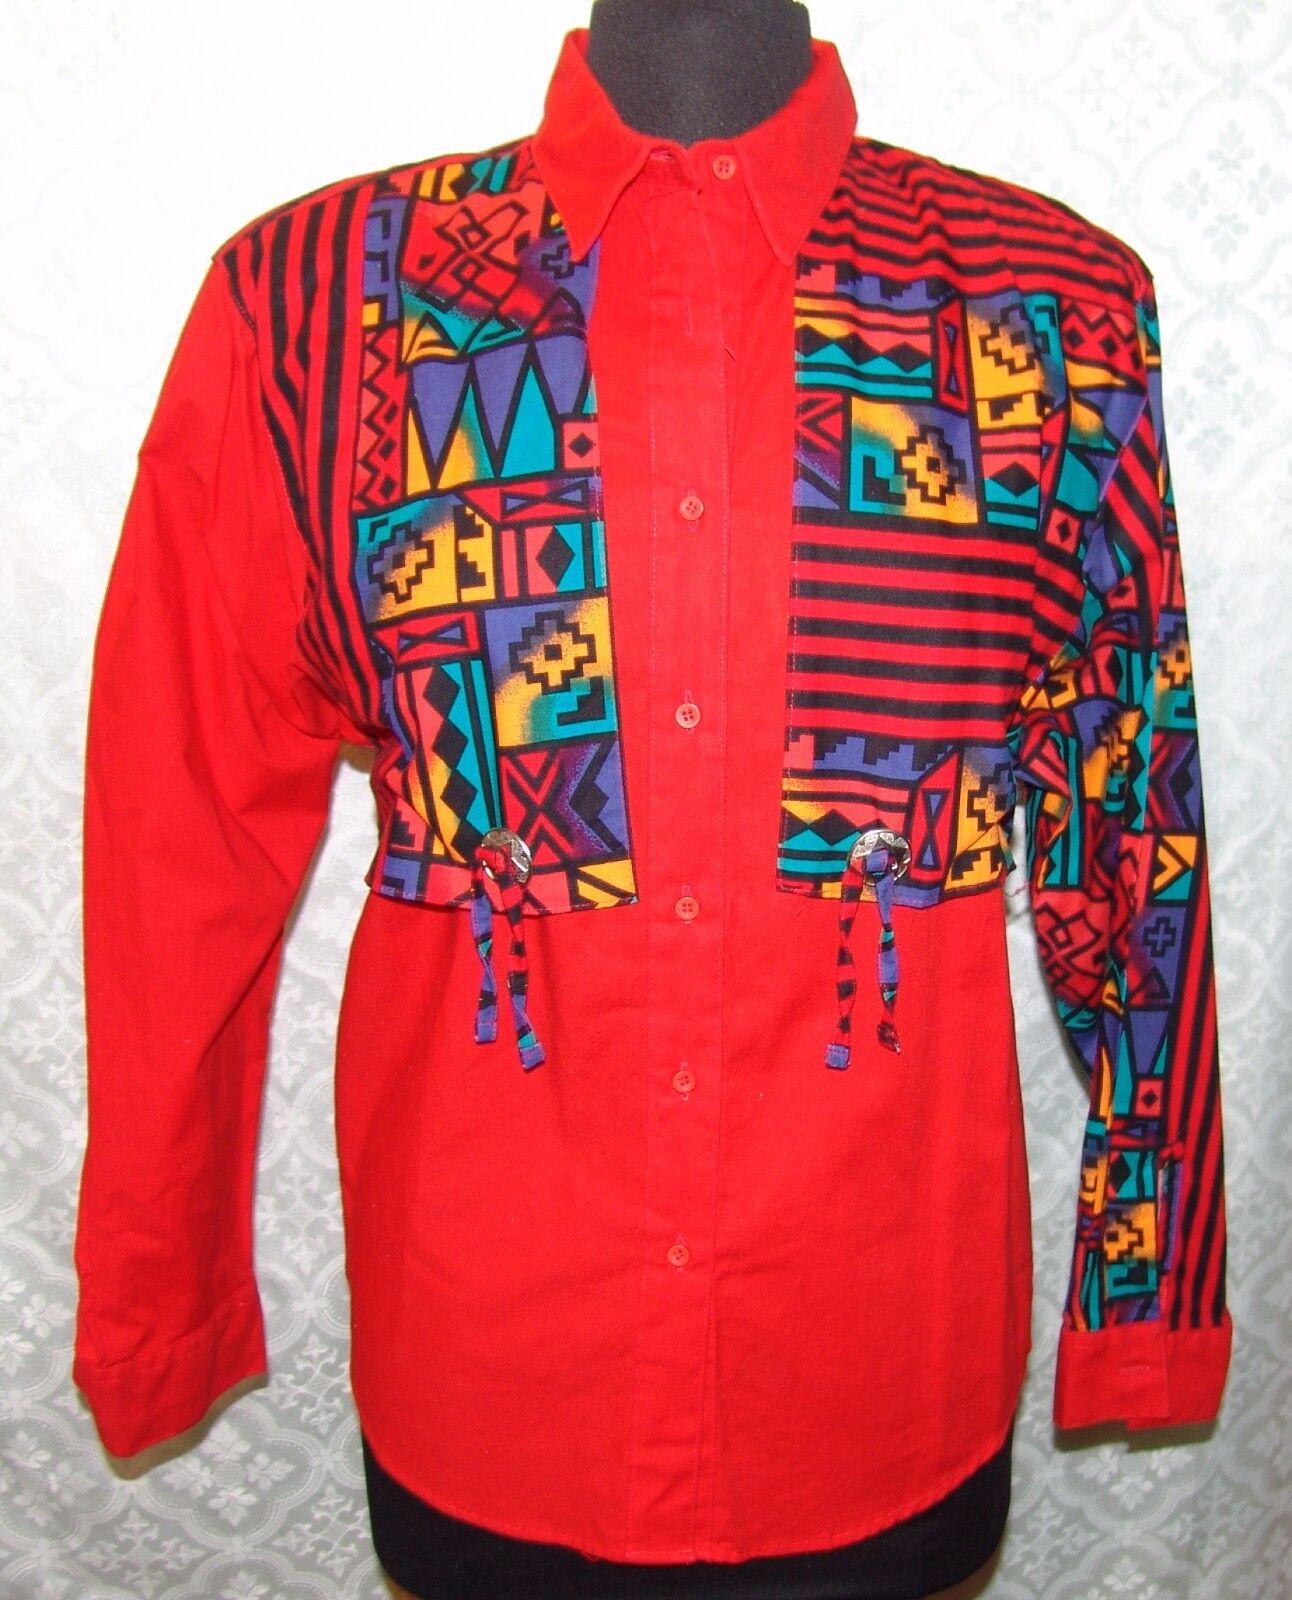 Wrangler Authentic Western Apparel Shirt M Womens Vtg Overlay Southwestern Aztec